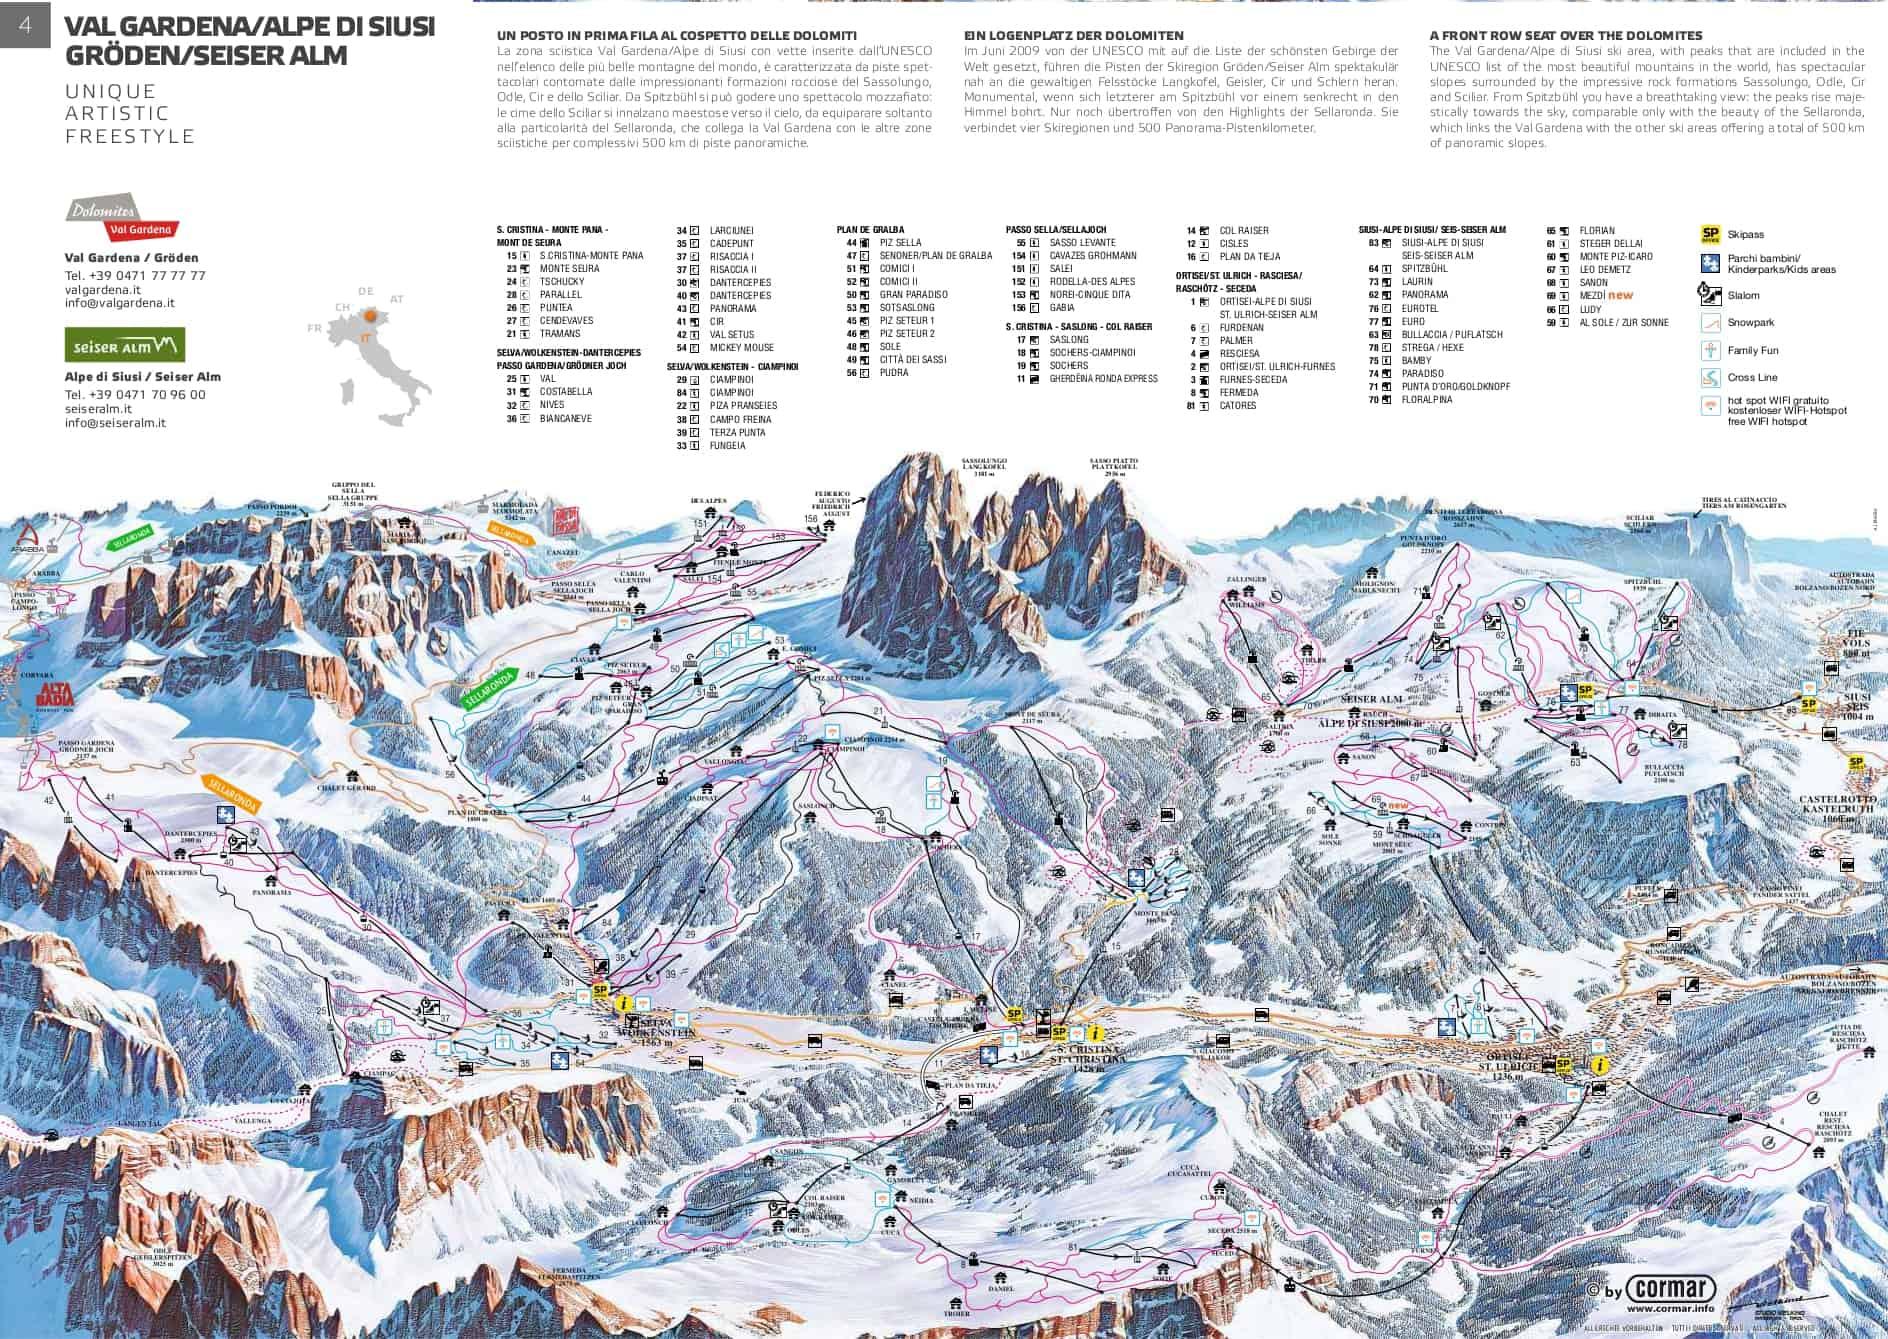 Val Gardena Alpe di Siusi Pistekort JPG